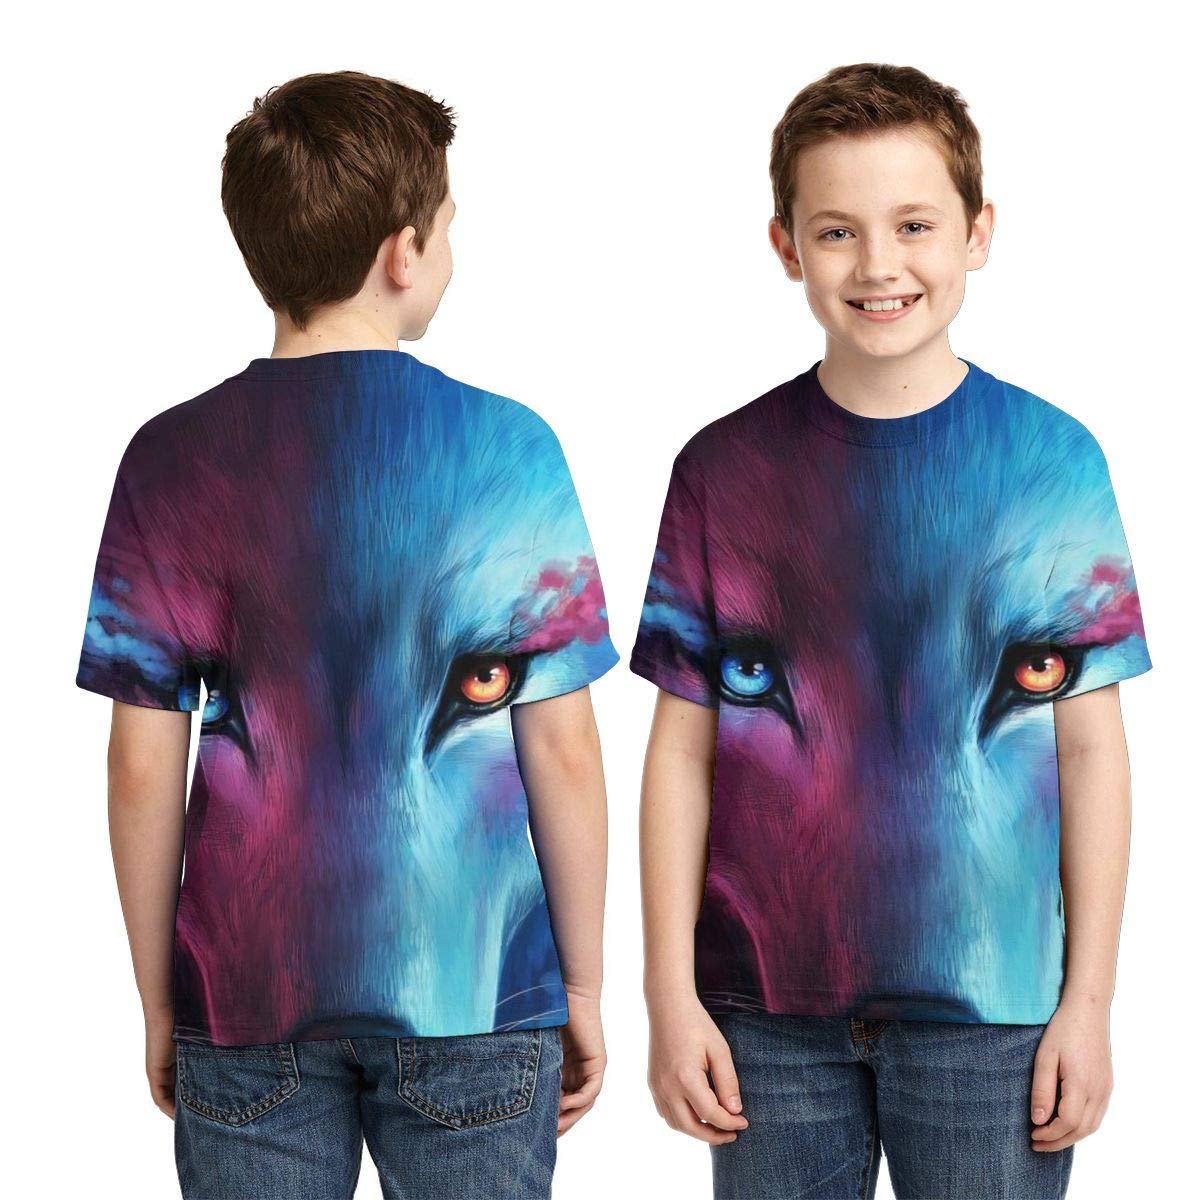 Boy Youth Kids Humor T-Shirt Short Sleeve Tee Cool Wolf